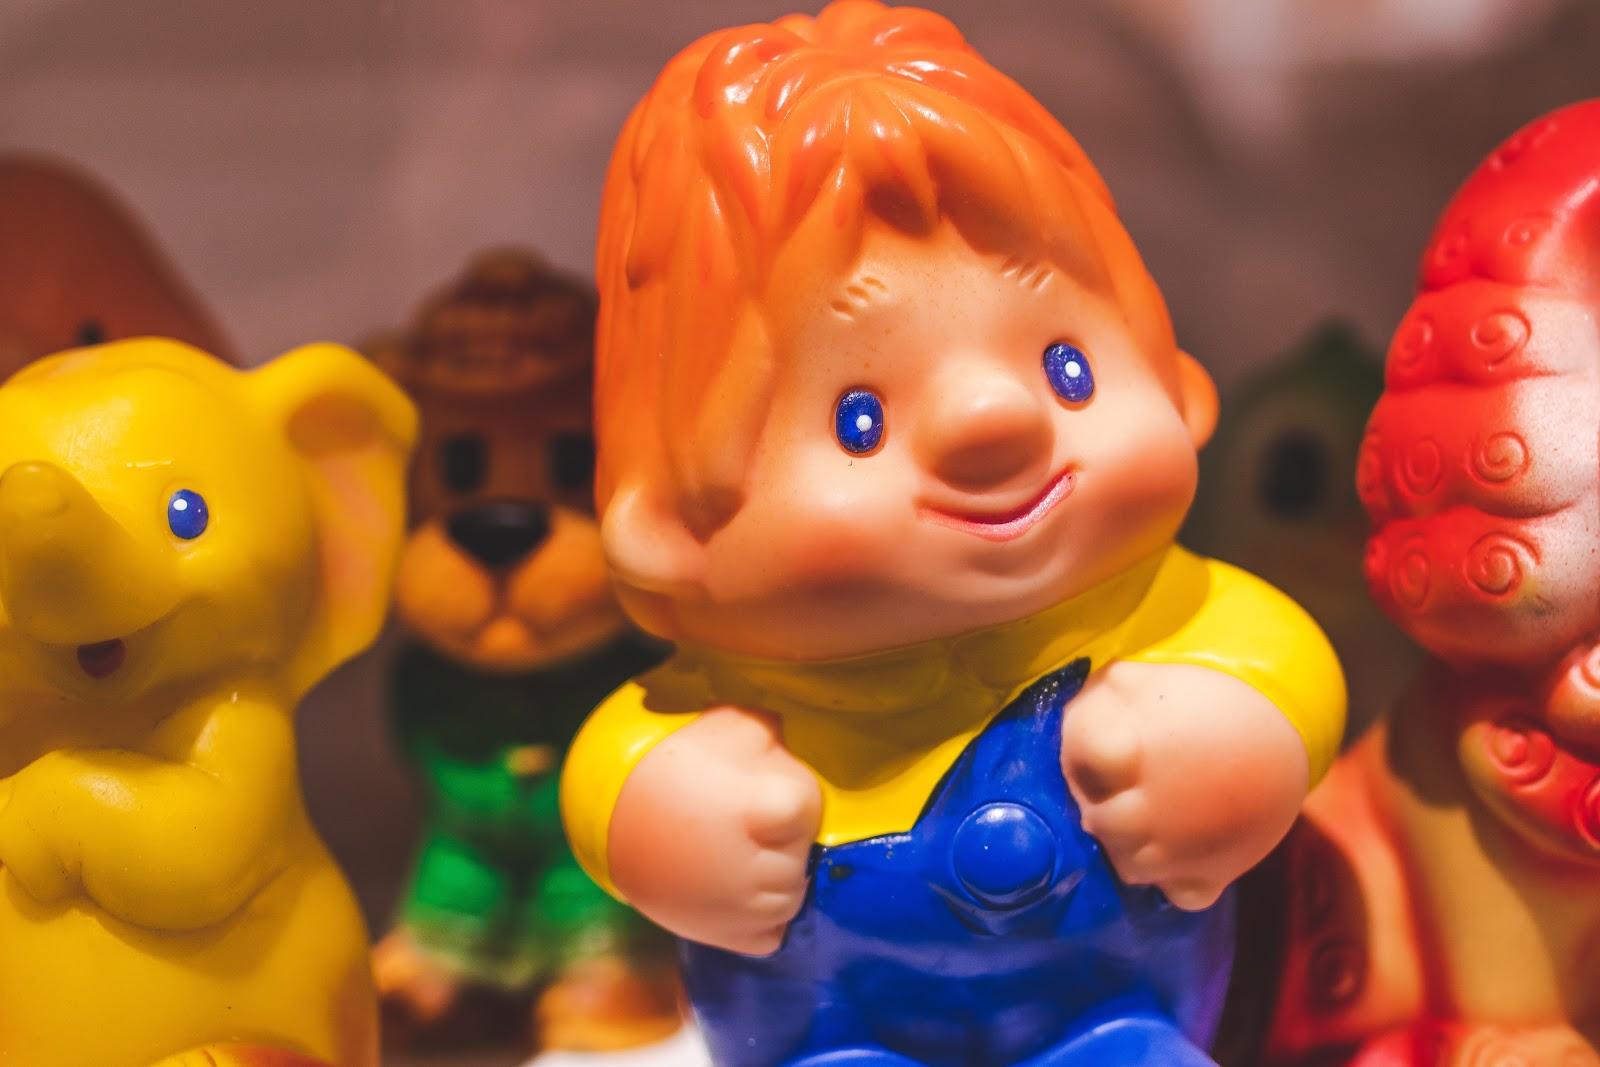 ADHD toys